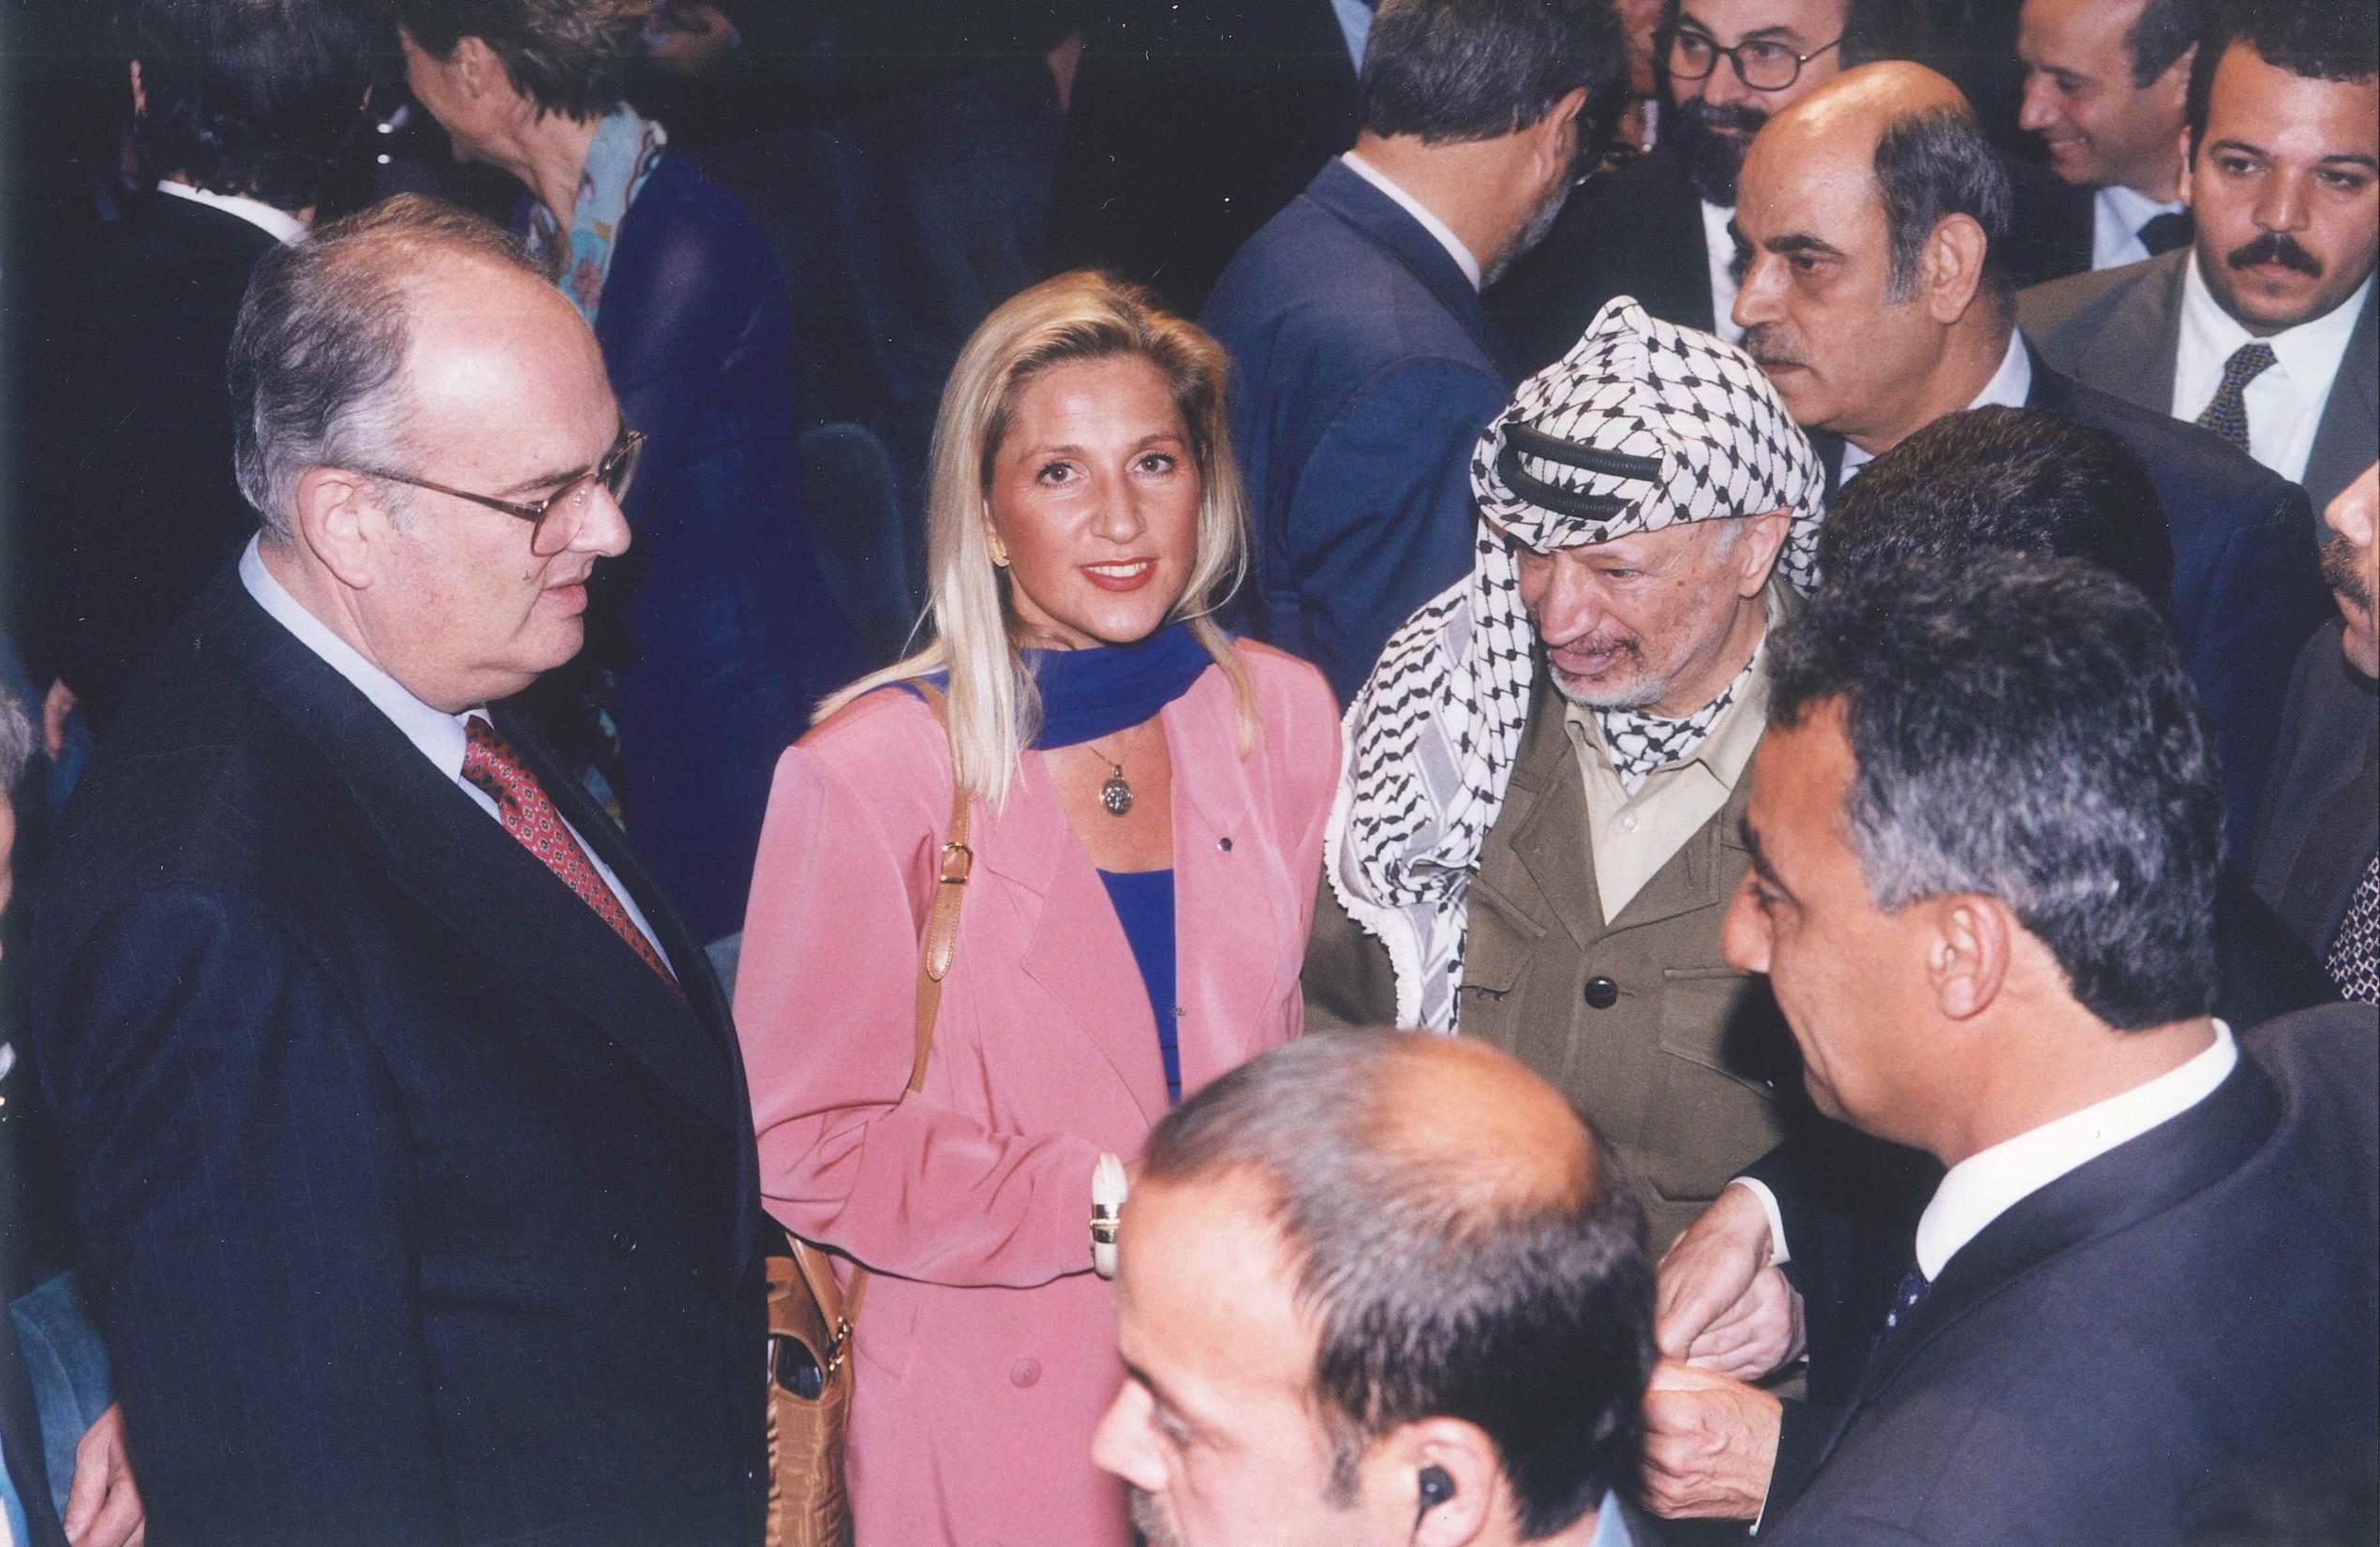 Firenze, 13 giugno 1998 - Ambasciatore Israeliano e Yasser Arafat